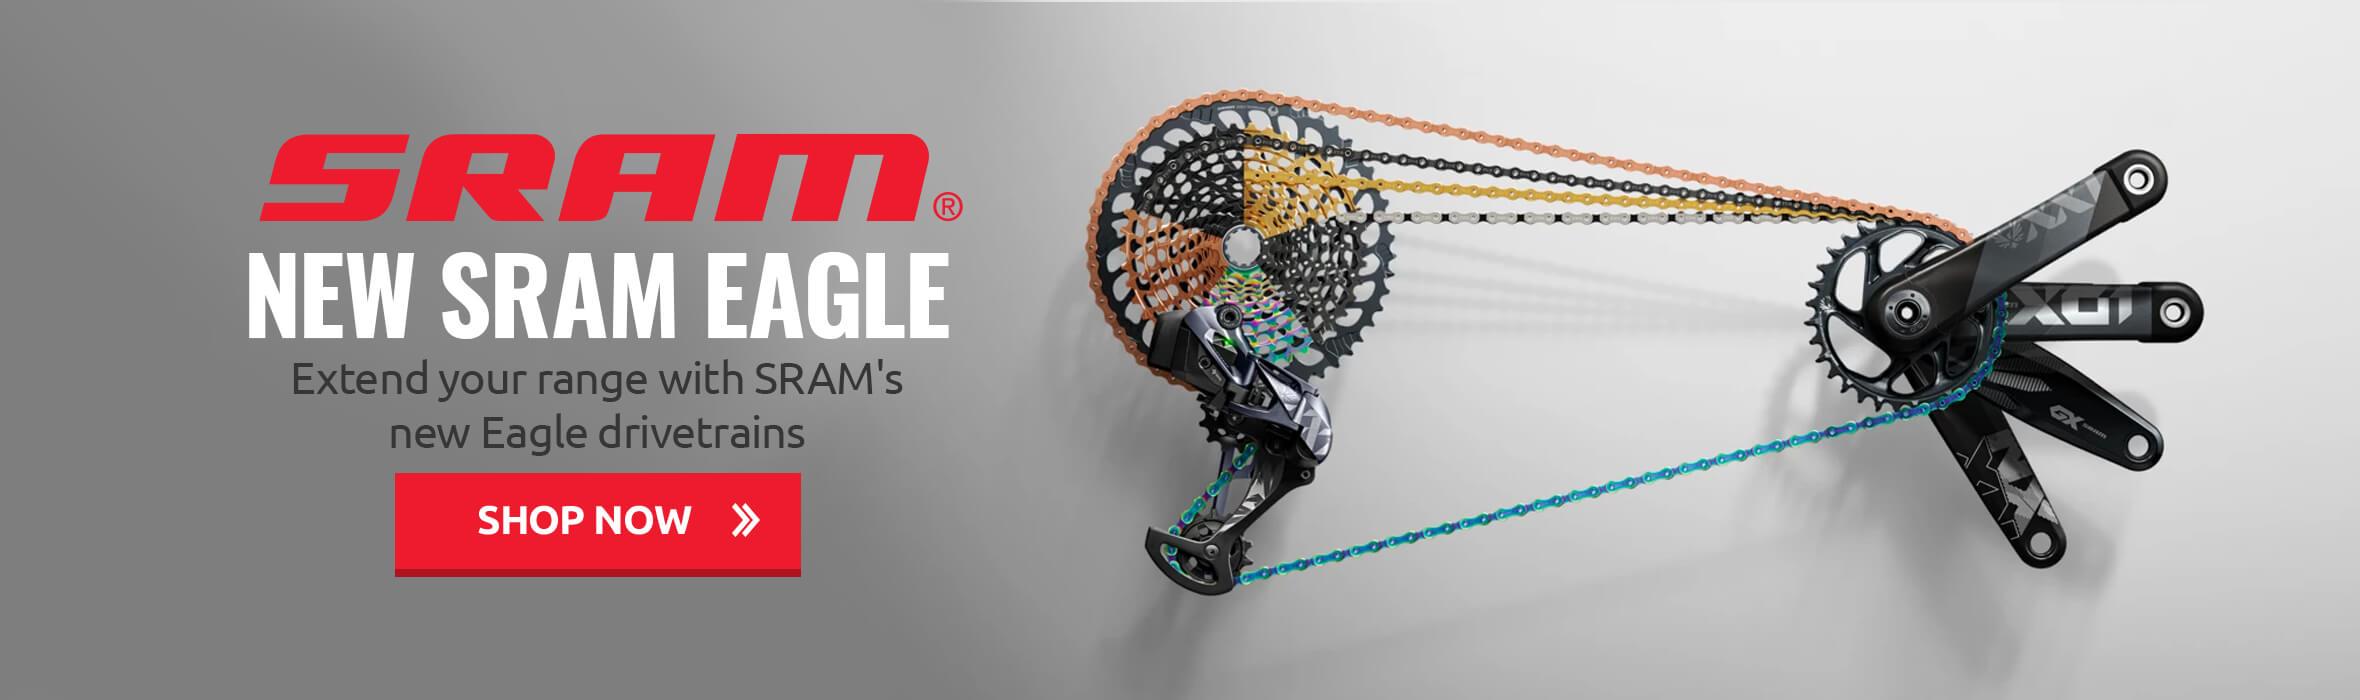 New SRAM Eagle